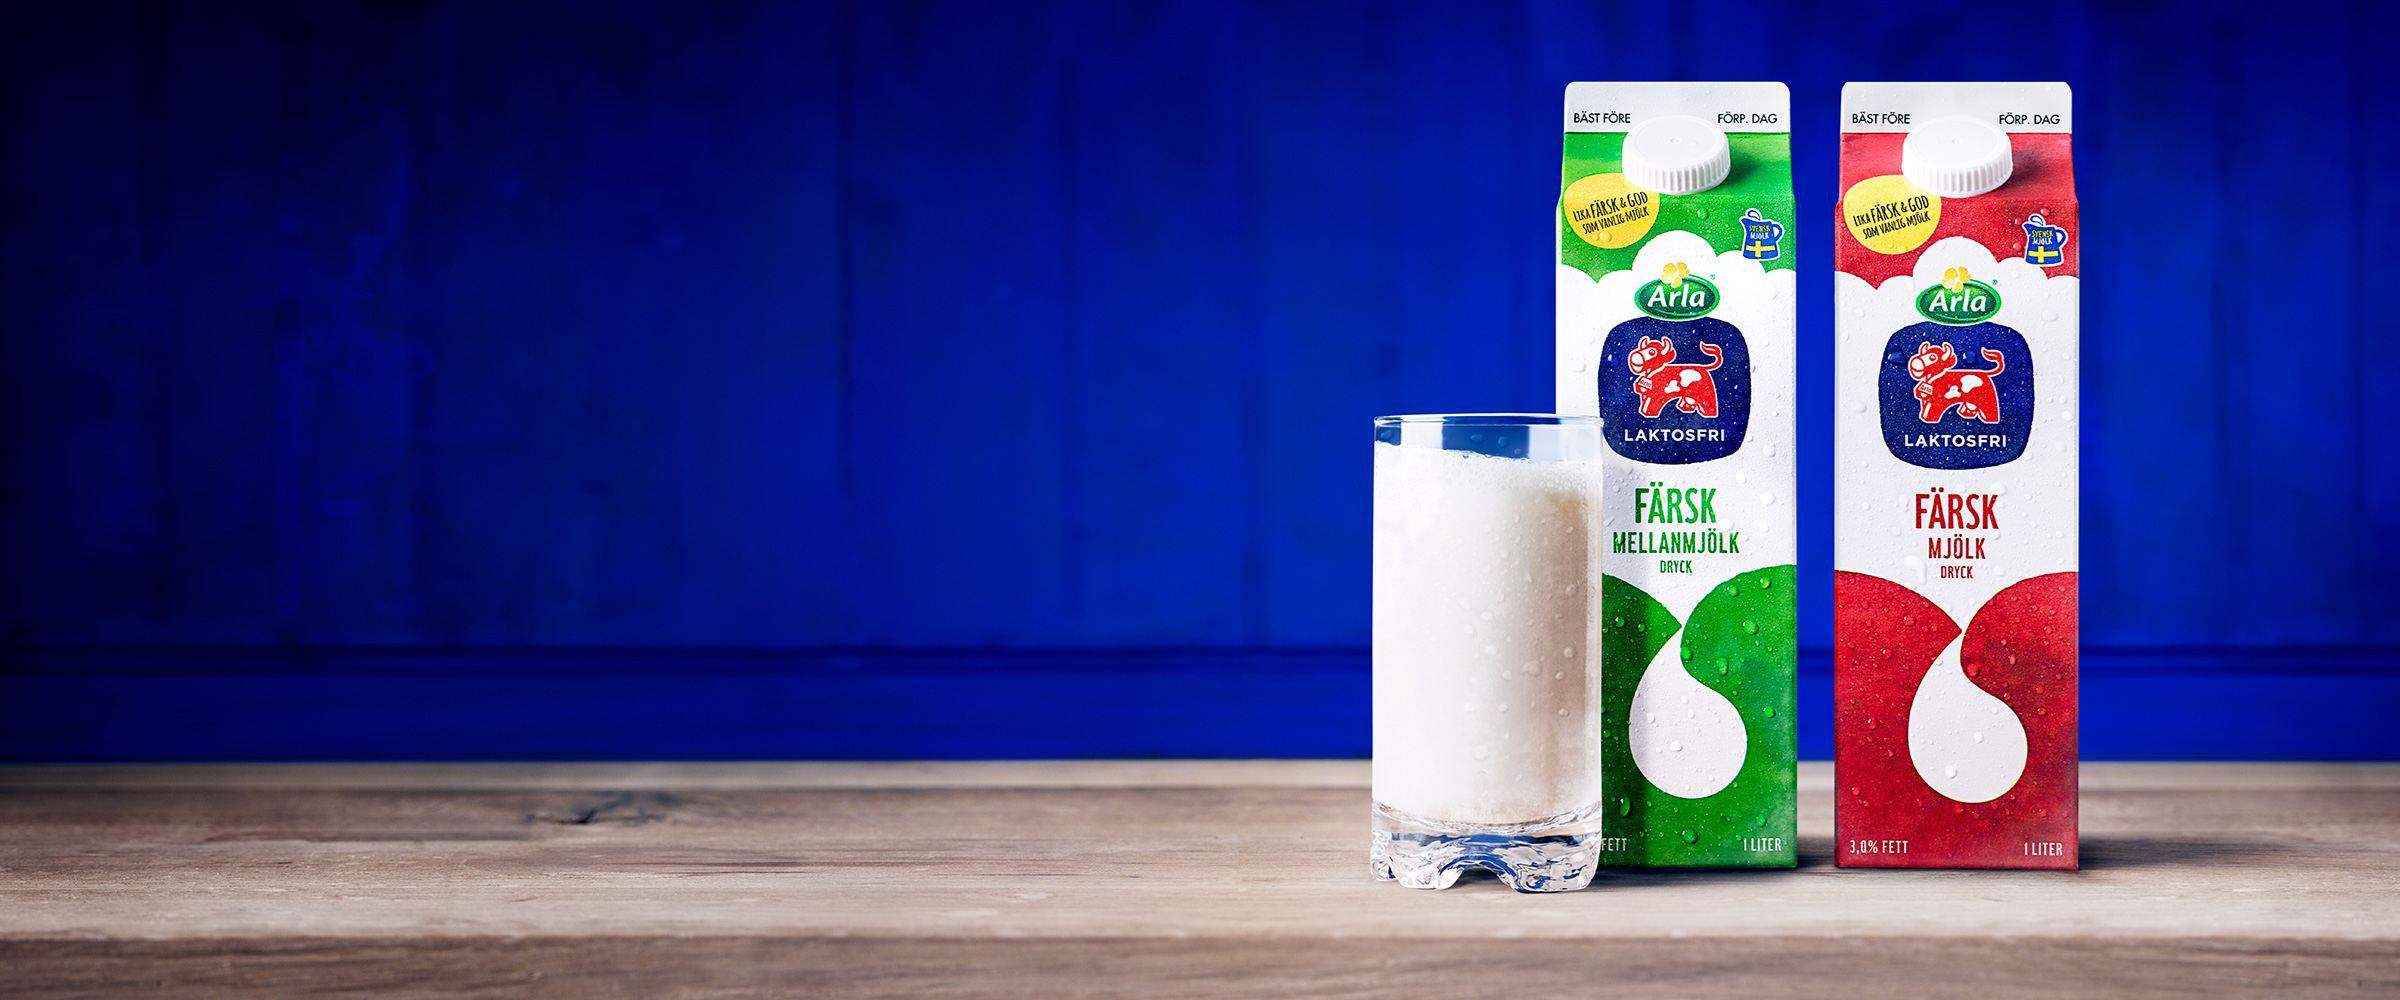 färsk laktosfri mjölk